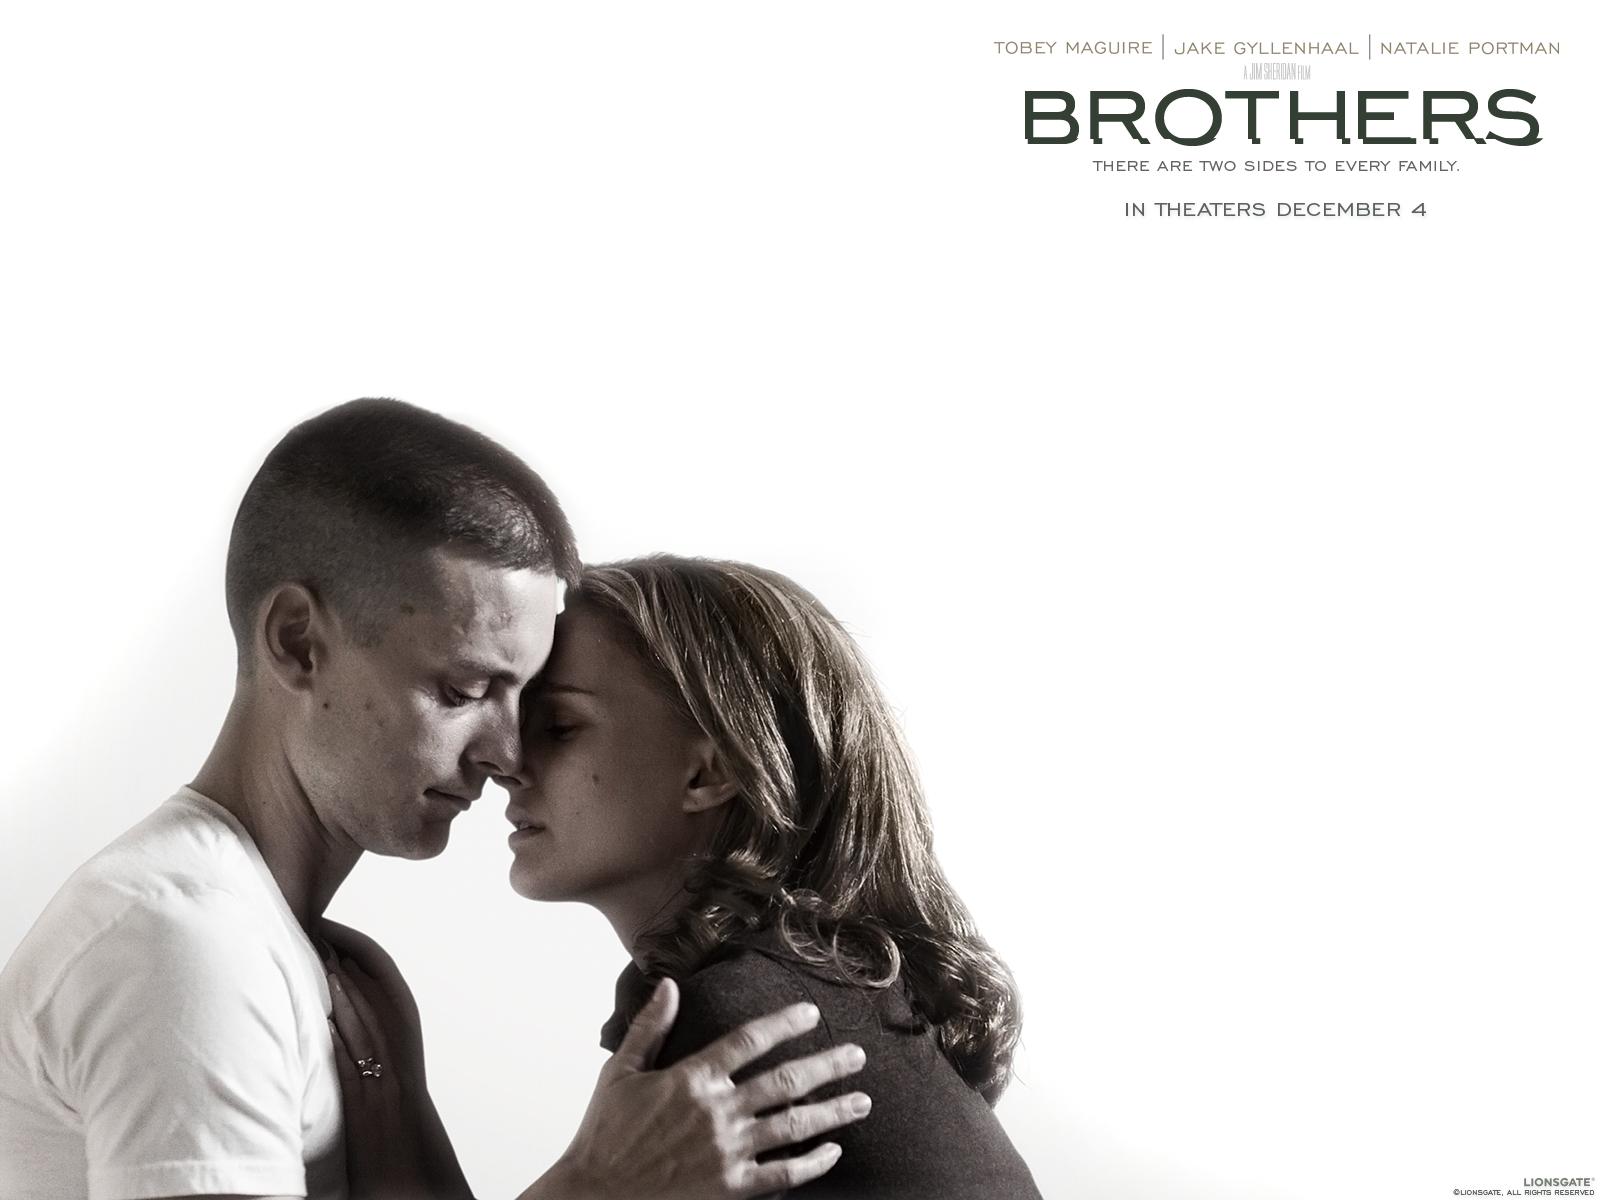 Tami Holman: brothers wallpapers